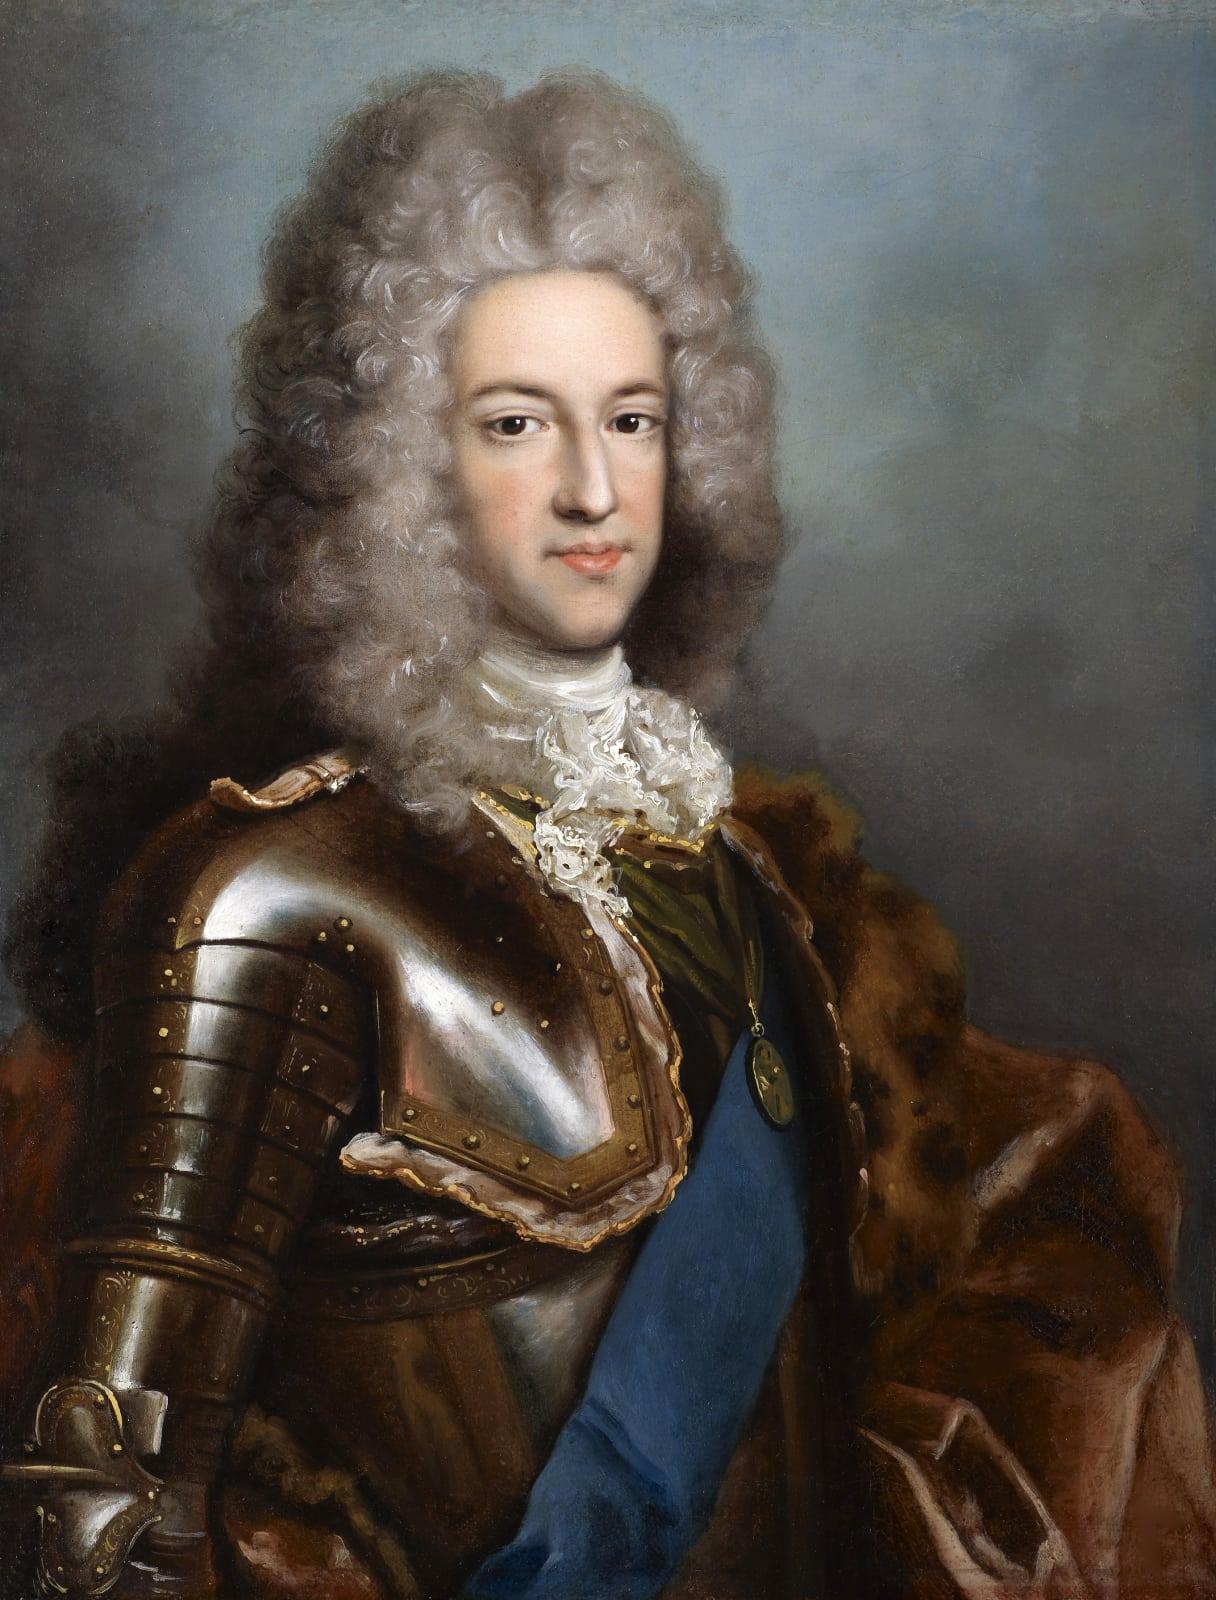 Prince James Edward Stuart, The Old Pretender (1688 – 1766),